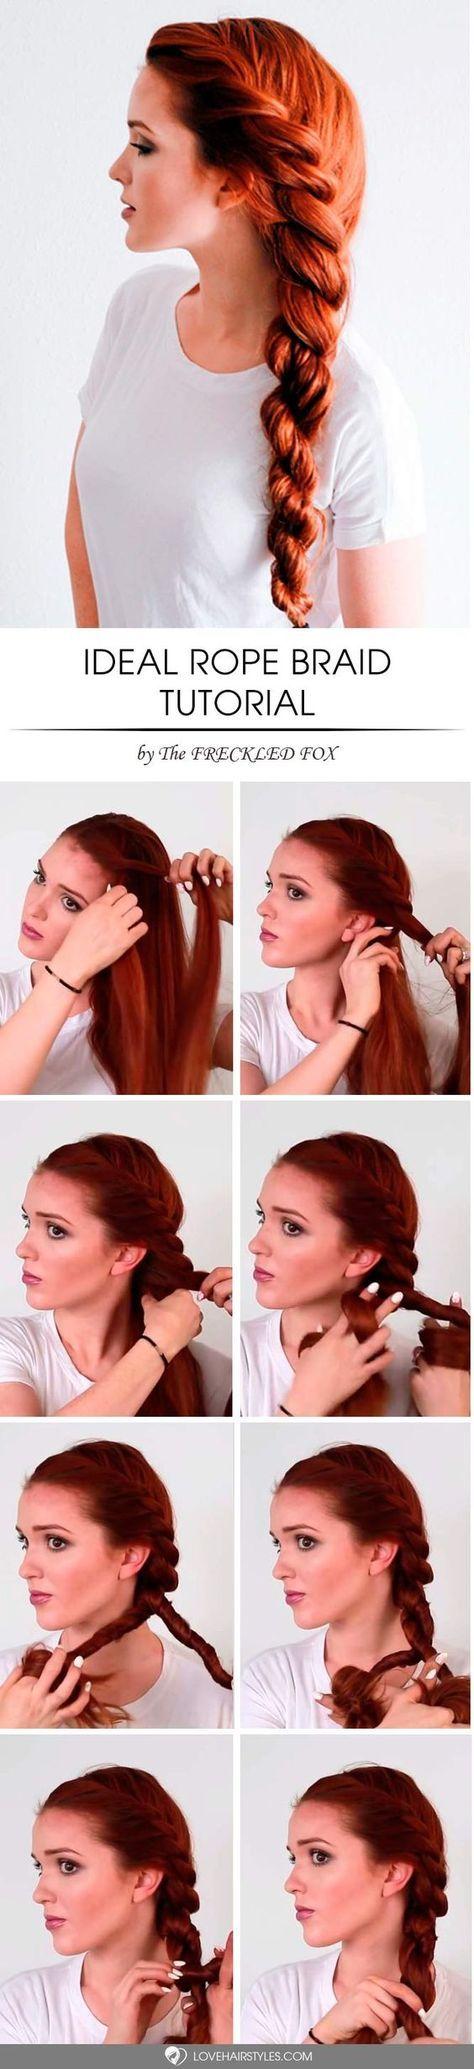 Truly Impressive Rope Braid Hairstyle ,  Sarah